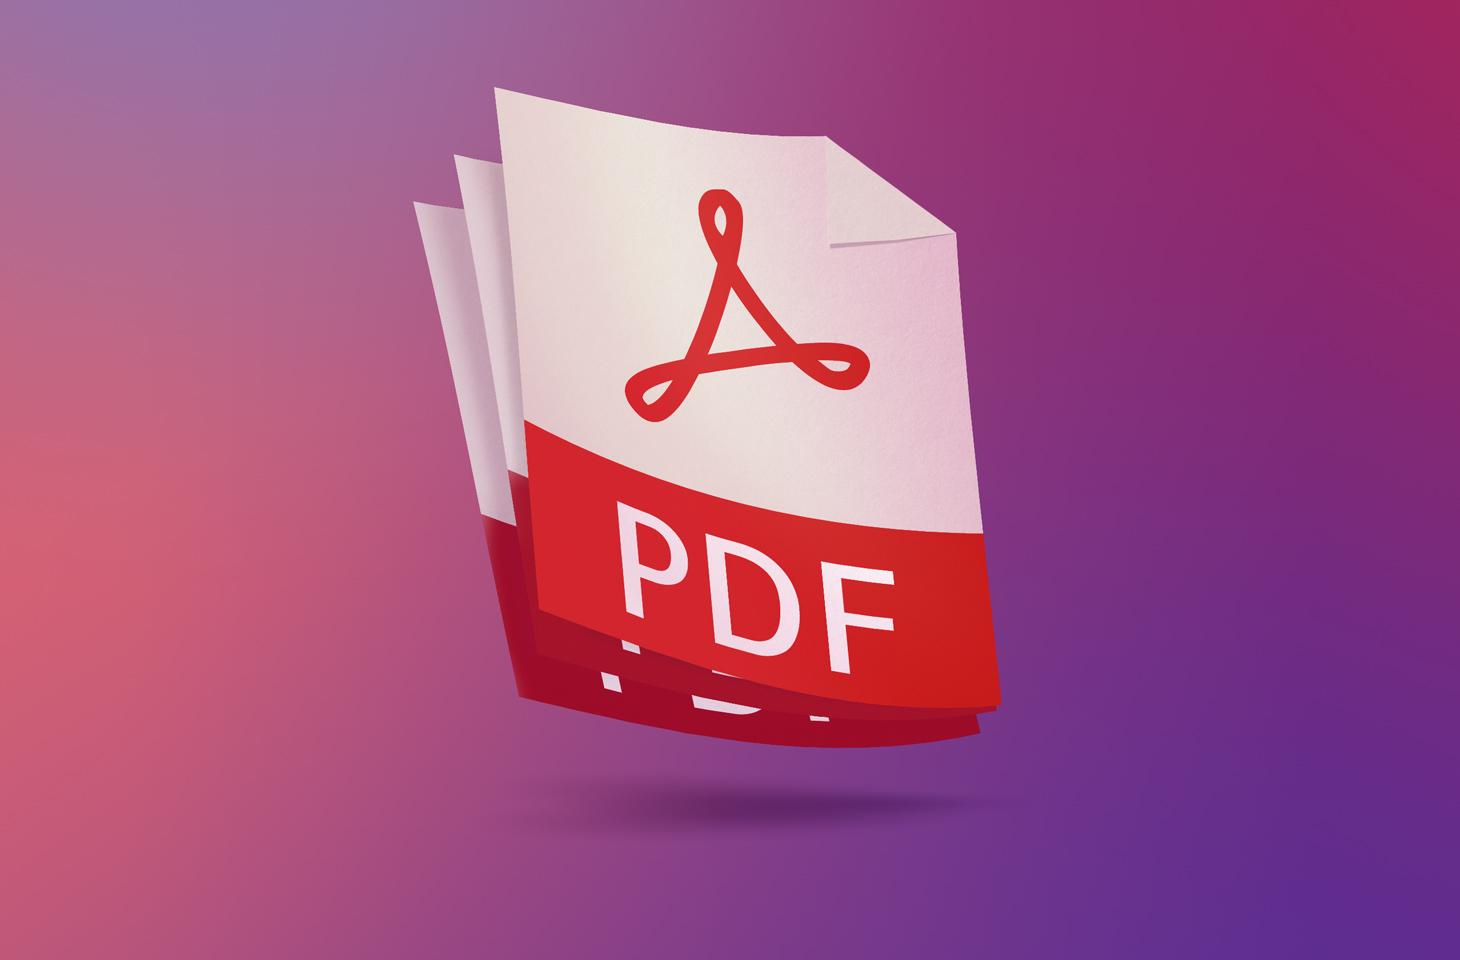 PDFファイルのデジタル署名は信用できるか